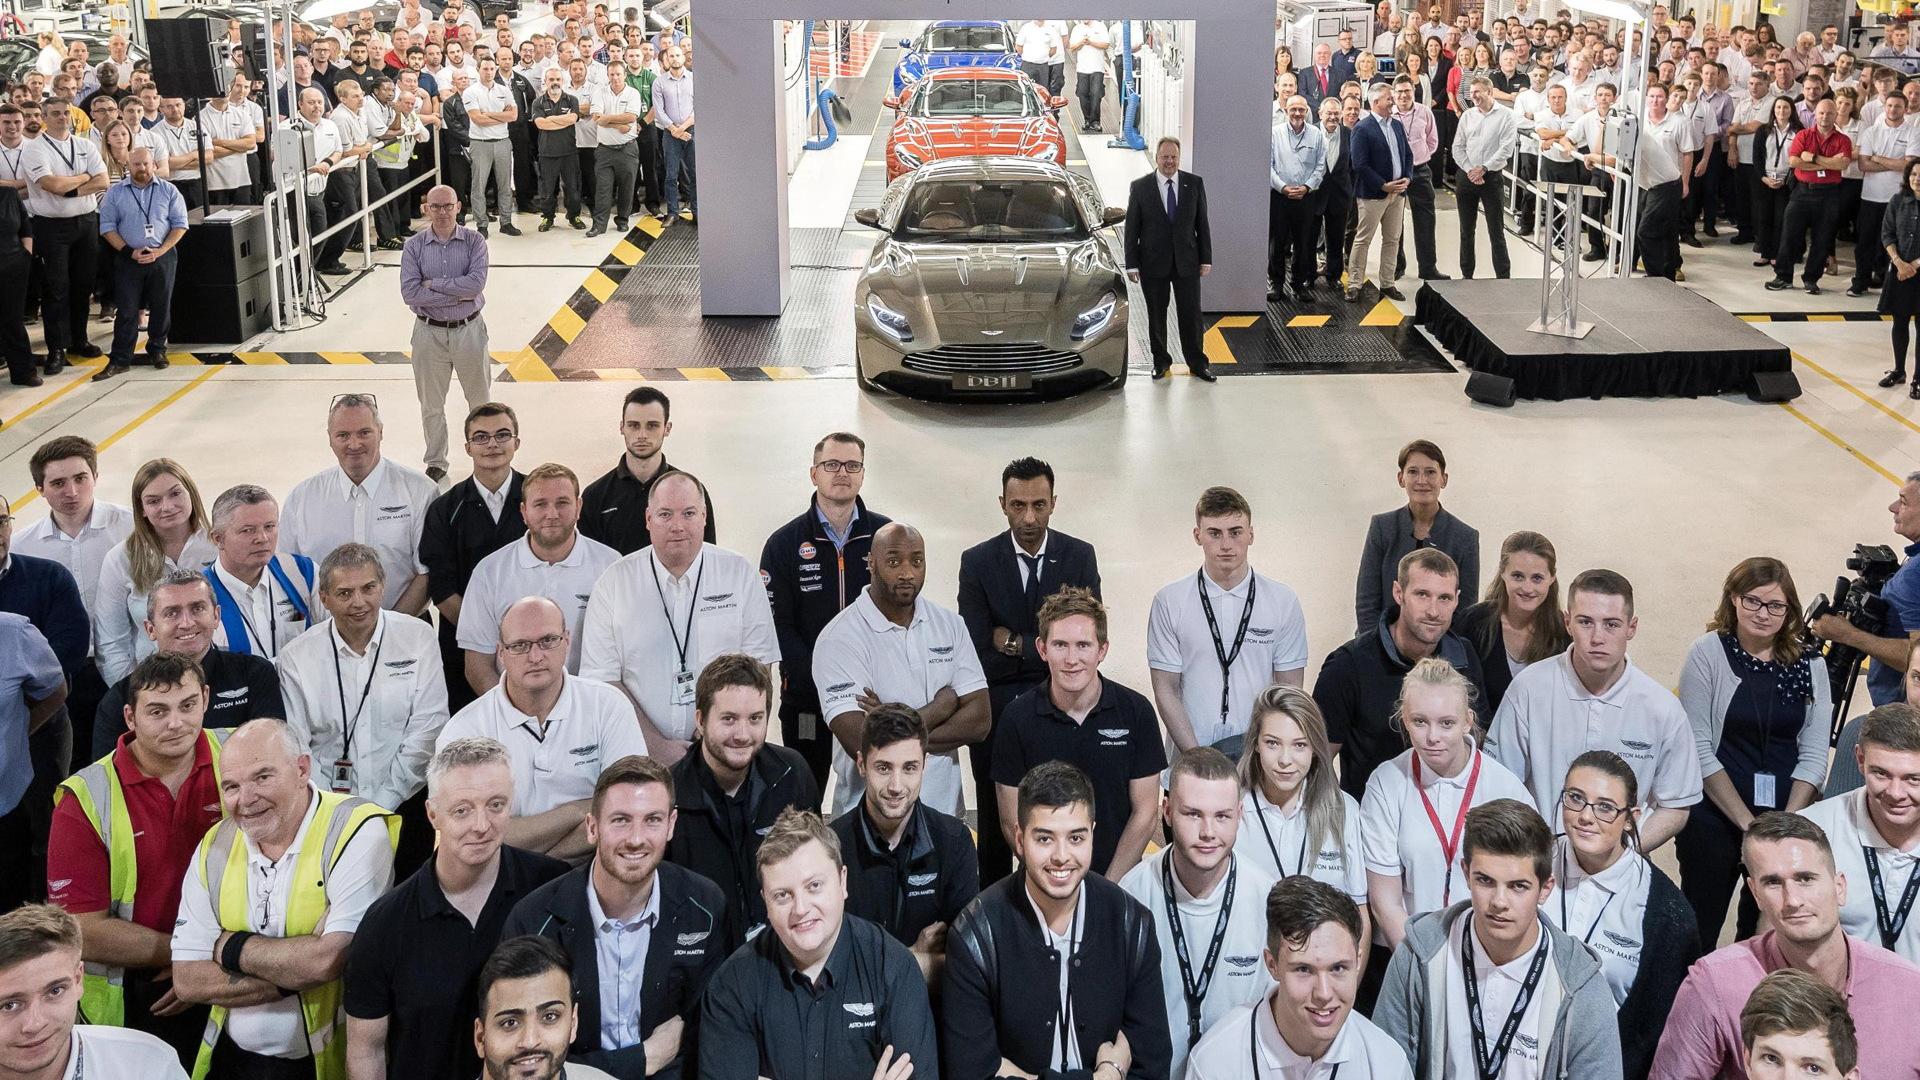 Aston Martin DB11 production starts in Gaydon, United Kingdom - September 2016